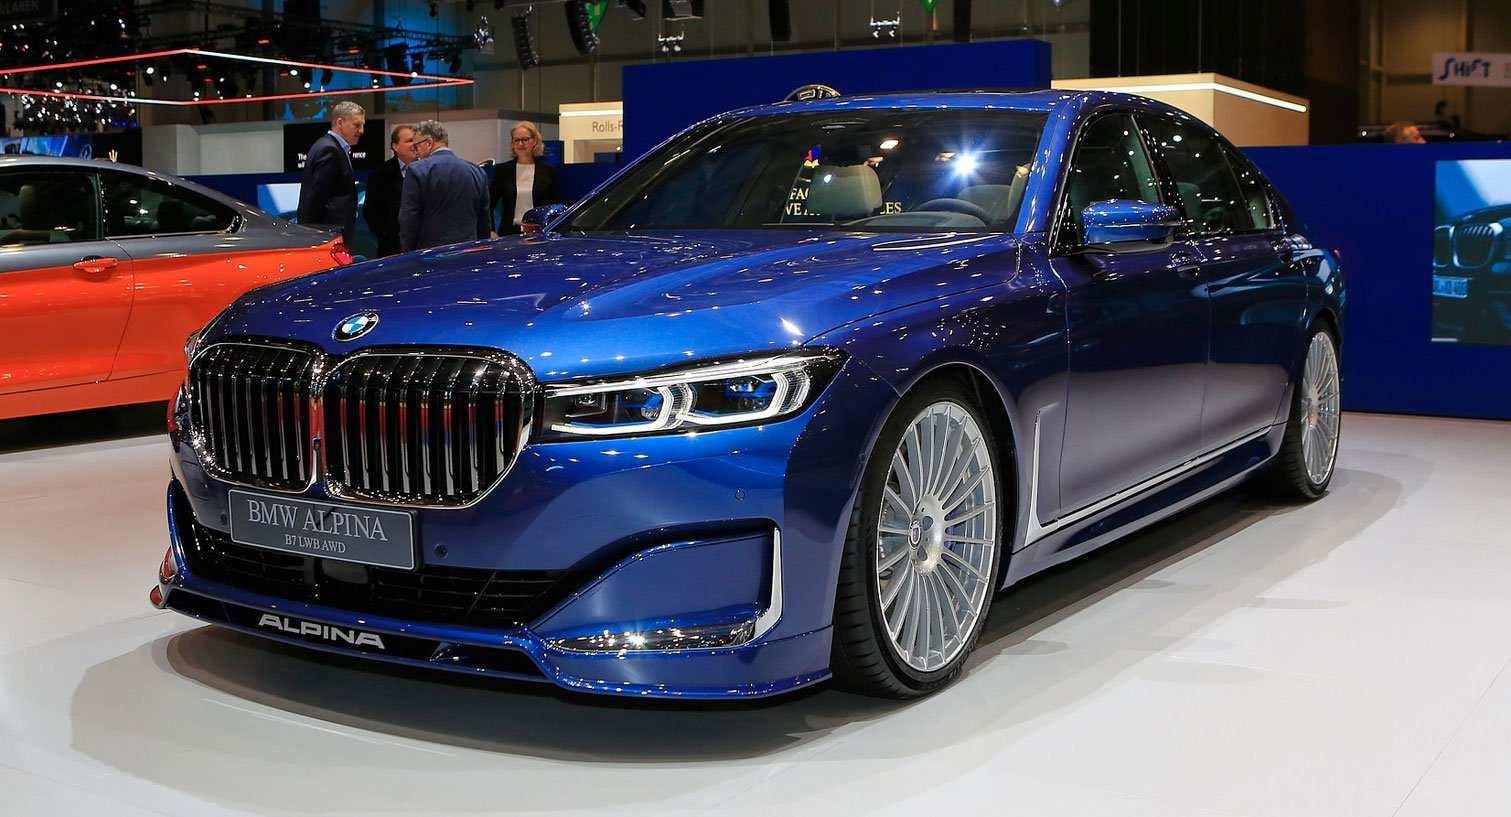 83 Gallery of BMW B7 Alpina 2020 Price Spesification with BMW B7 Alpina 2020 Price